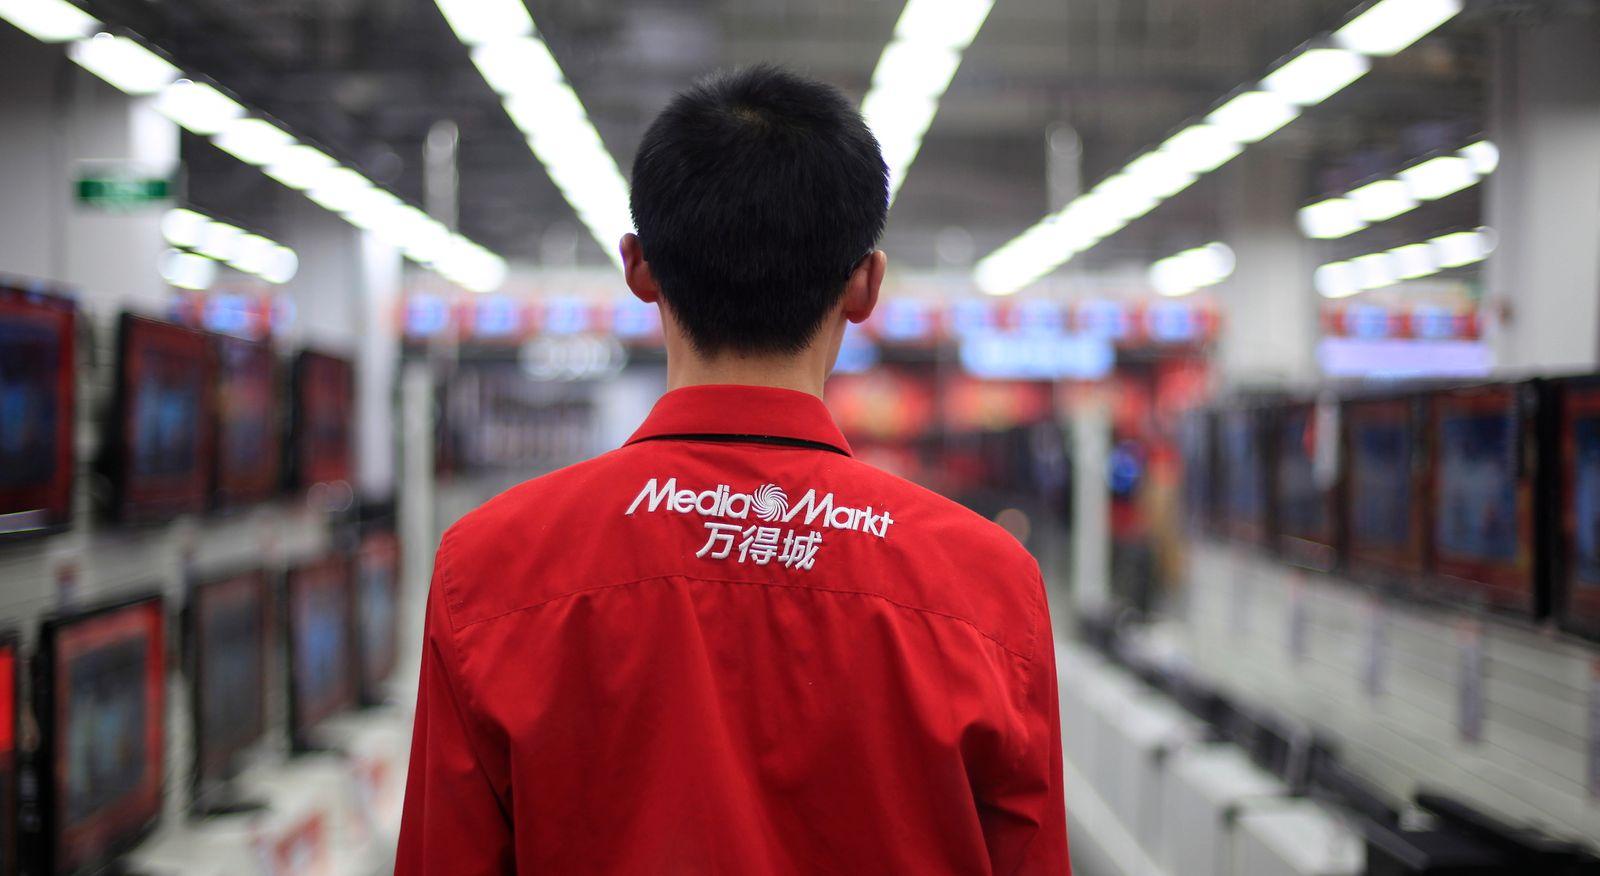 Media Markt / China / Shanghai